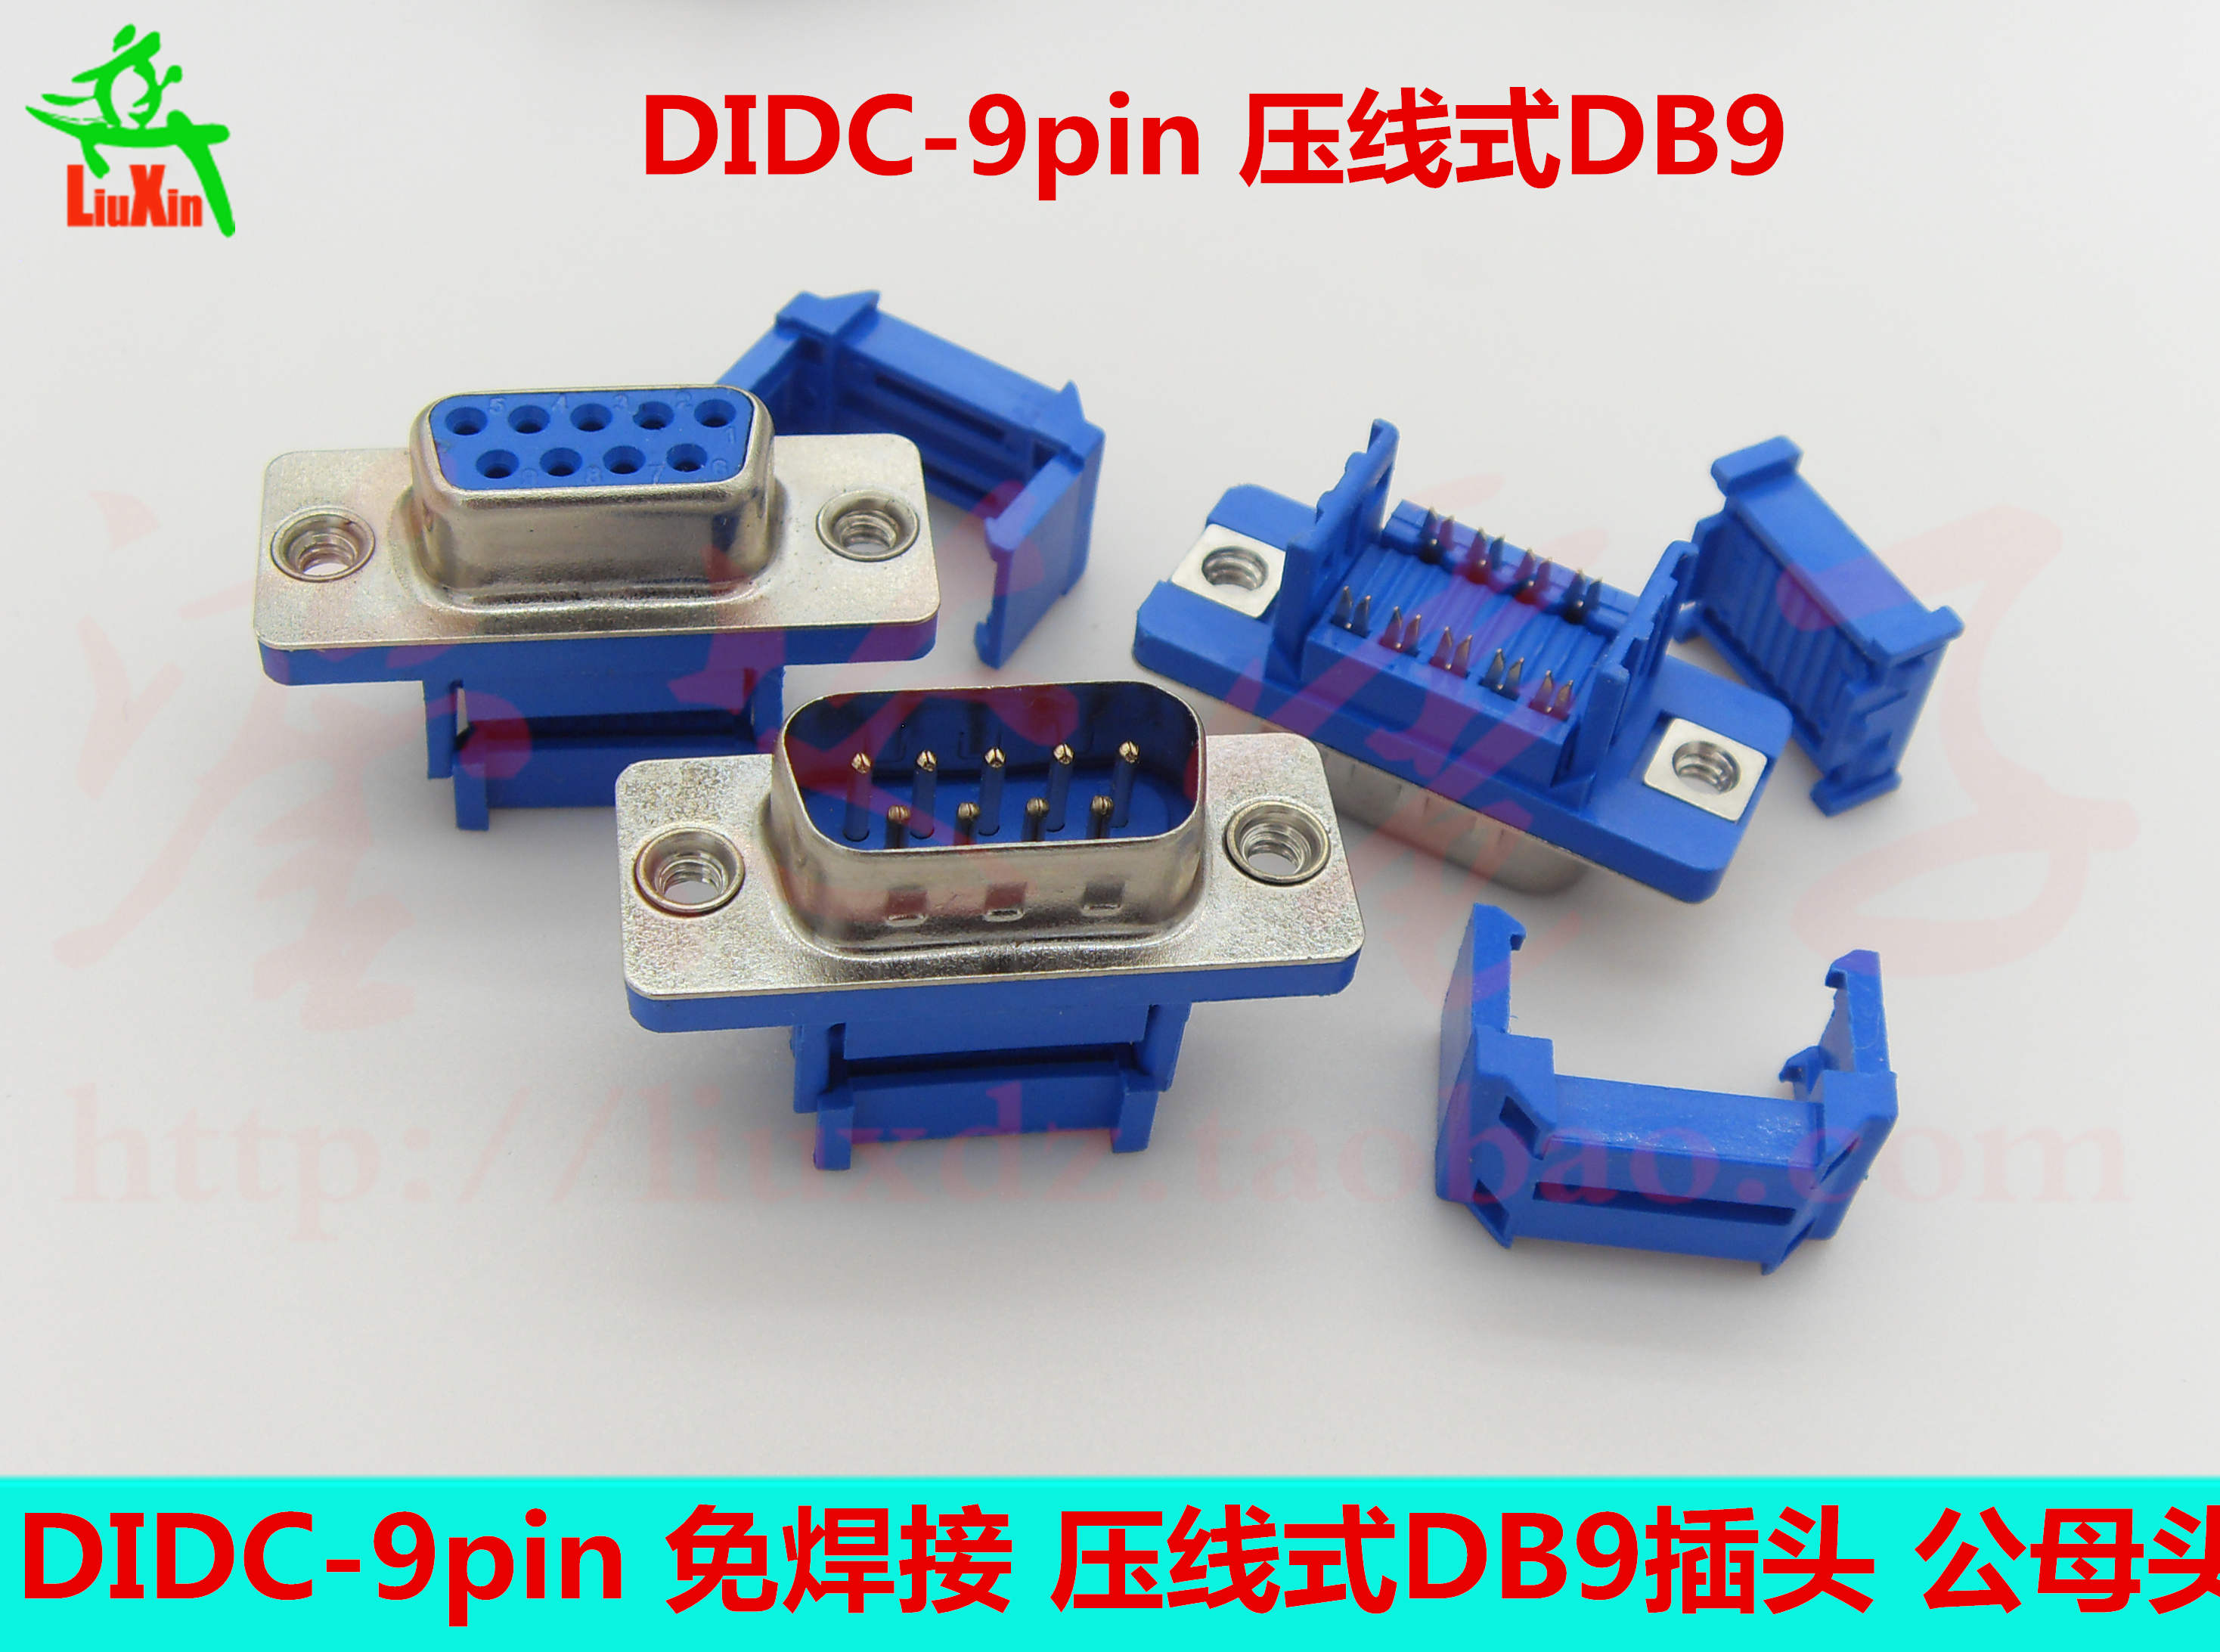 DIDC-9P 公/母头 免焊压线式DB9插头插座 连接器 蓝胶9针D型头